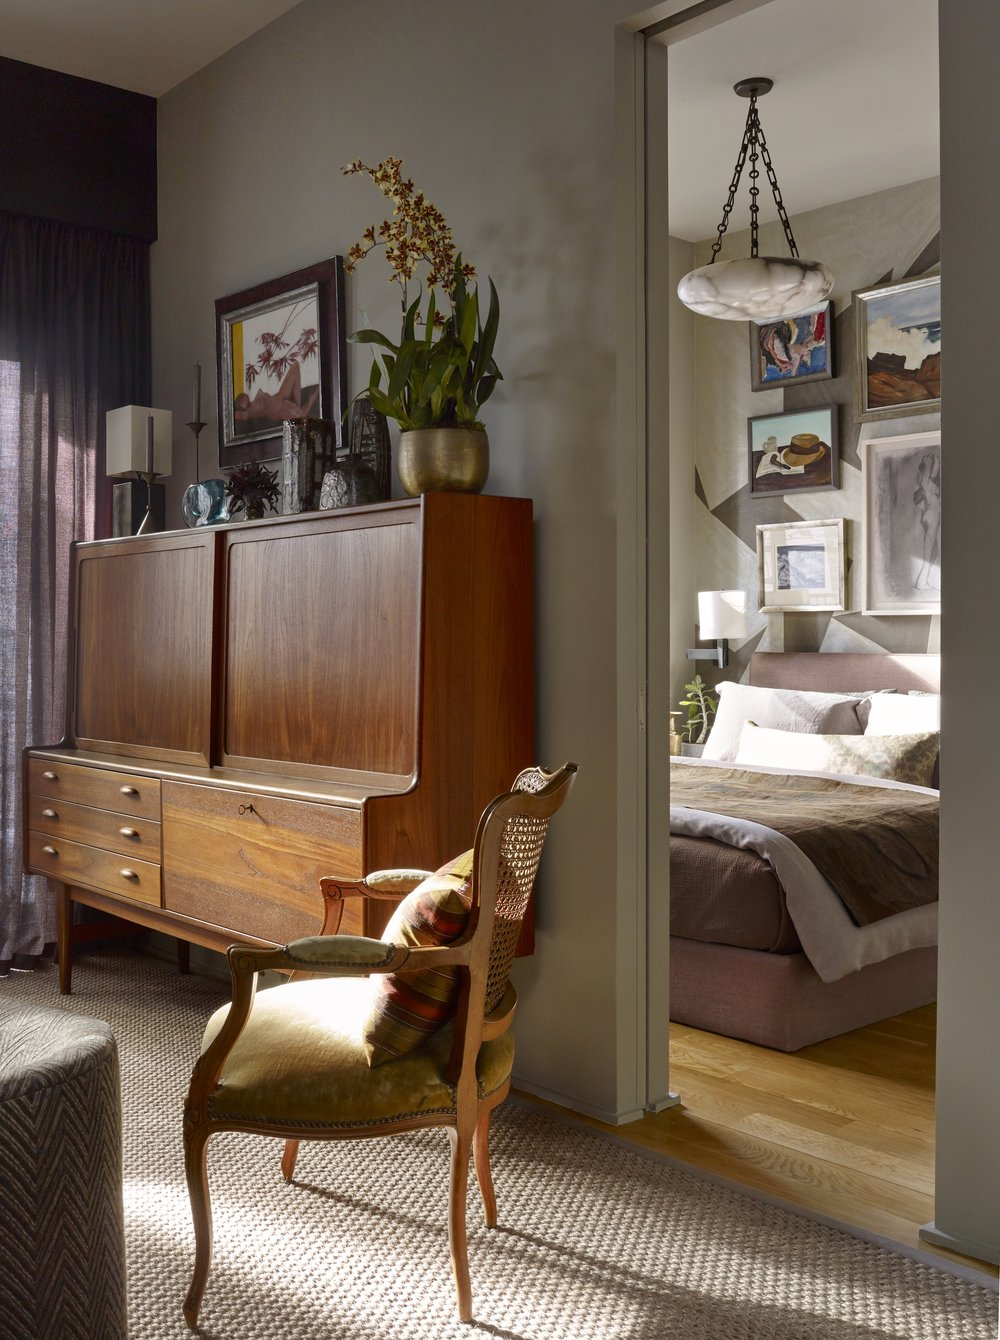 House Beautiful_Small Spaces_Joshua Greene_10.jpeg